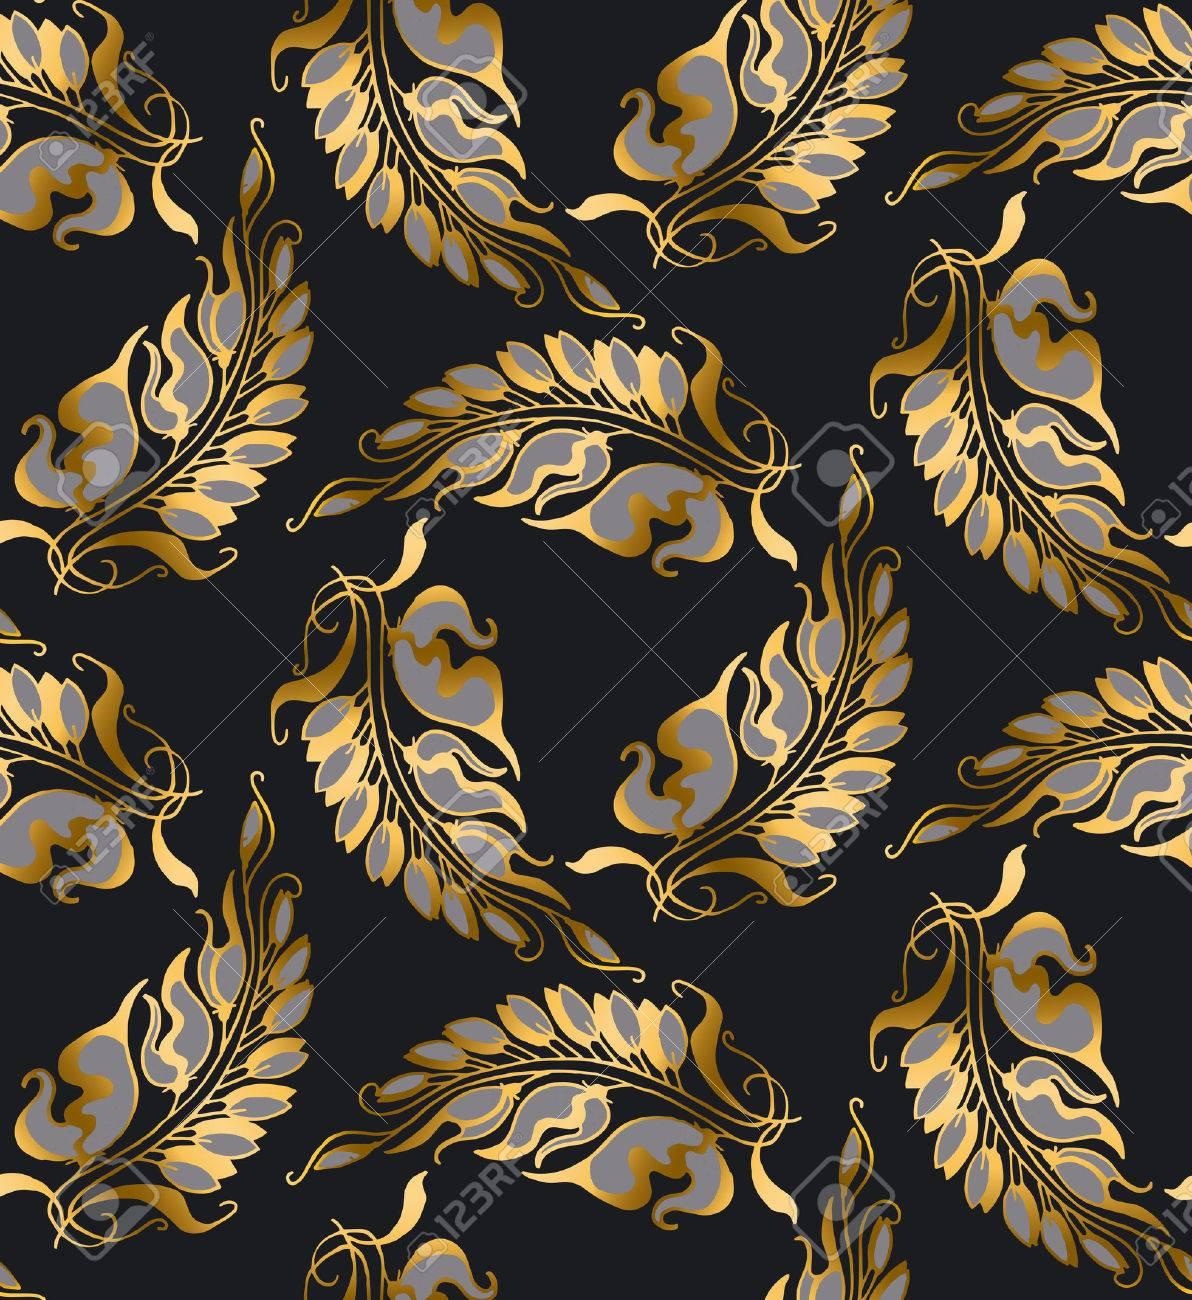 gold art nouveau style pattern illustration royalty free cliparts